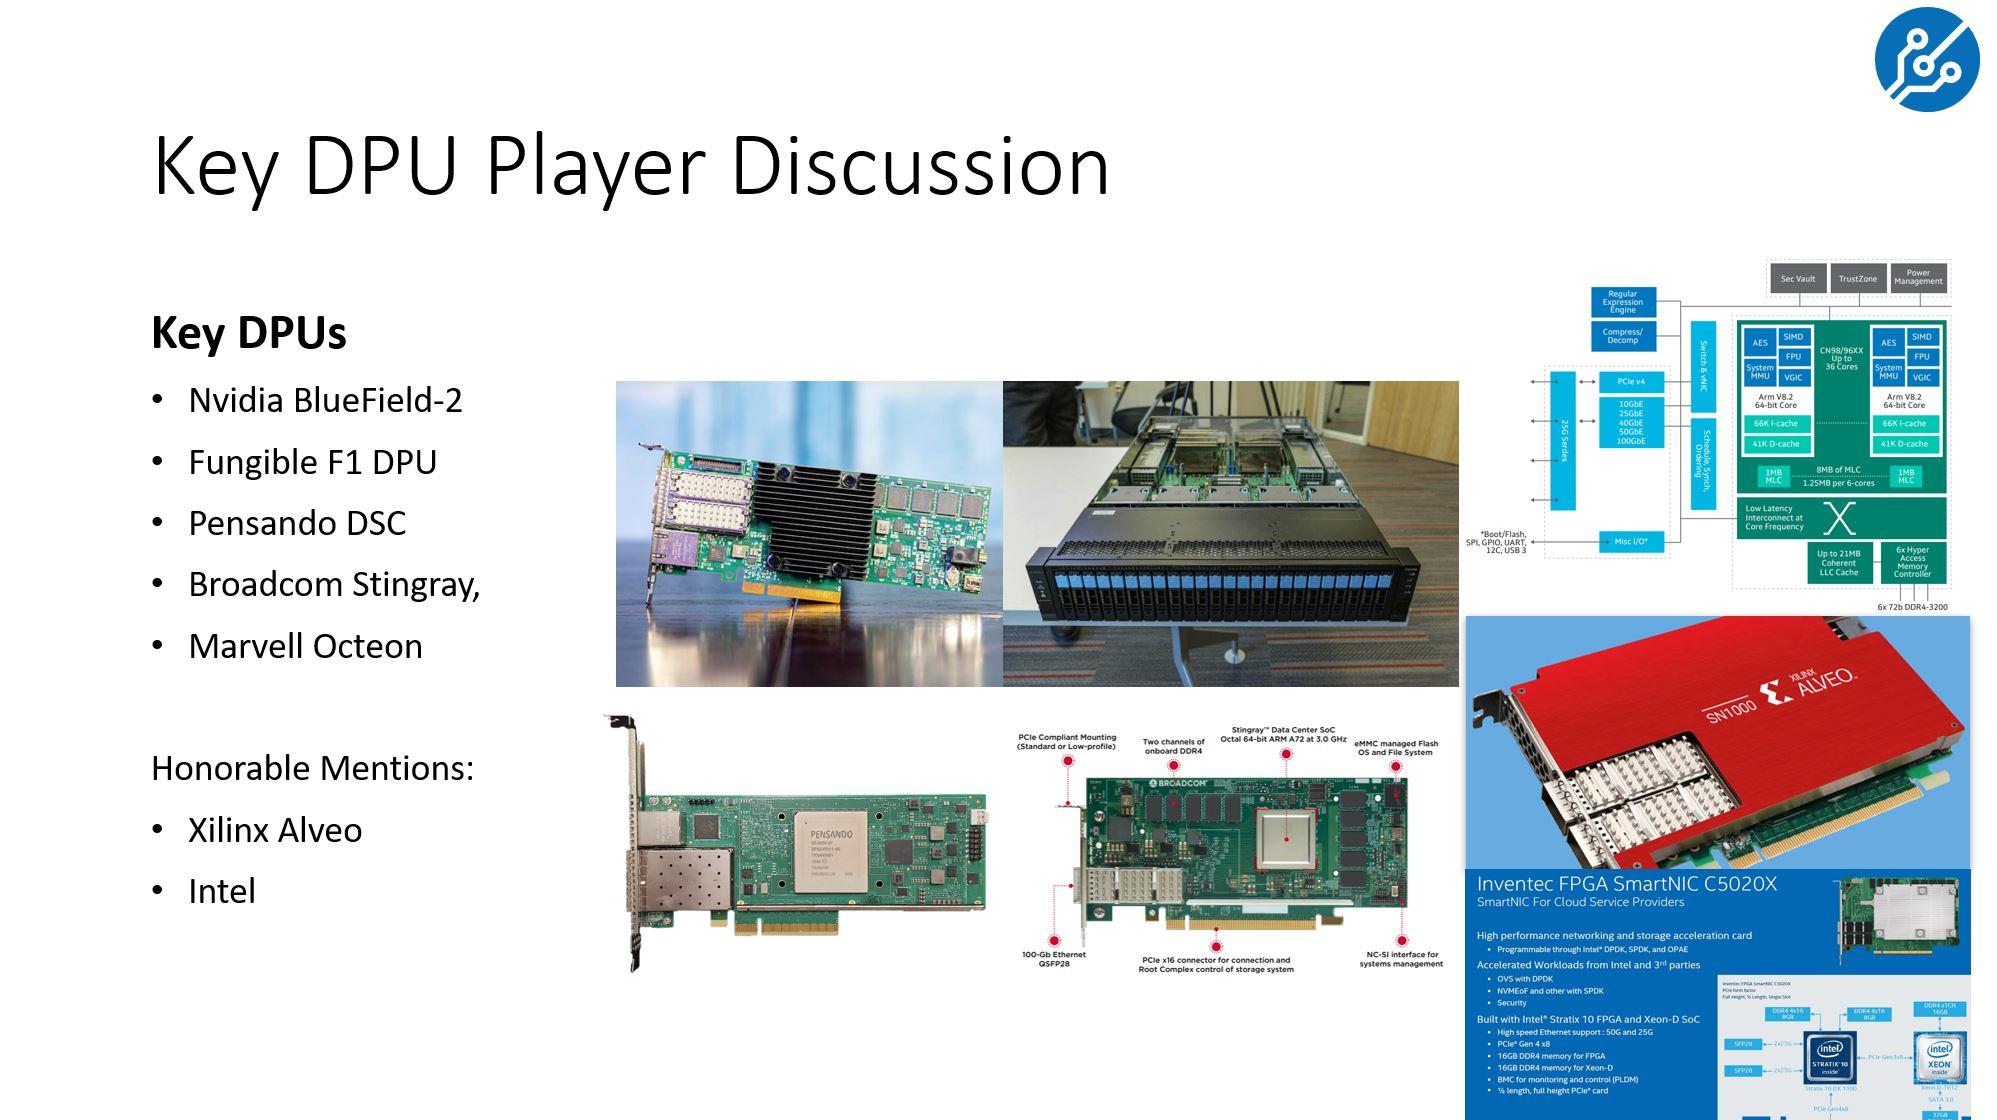 Key DPU Player Discussion Q2 2021